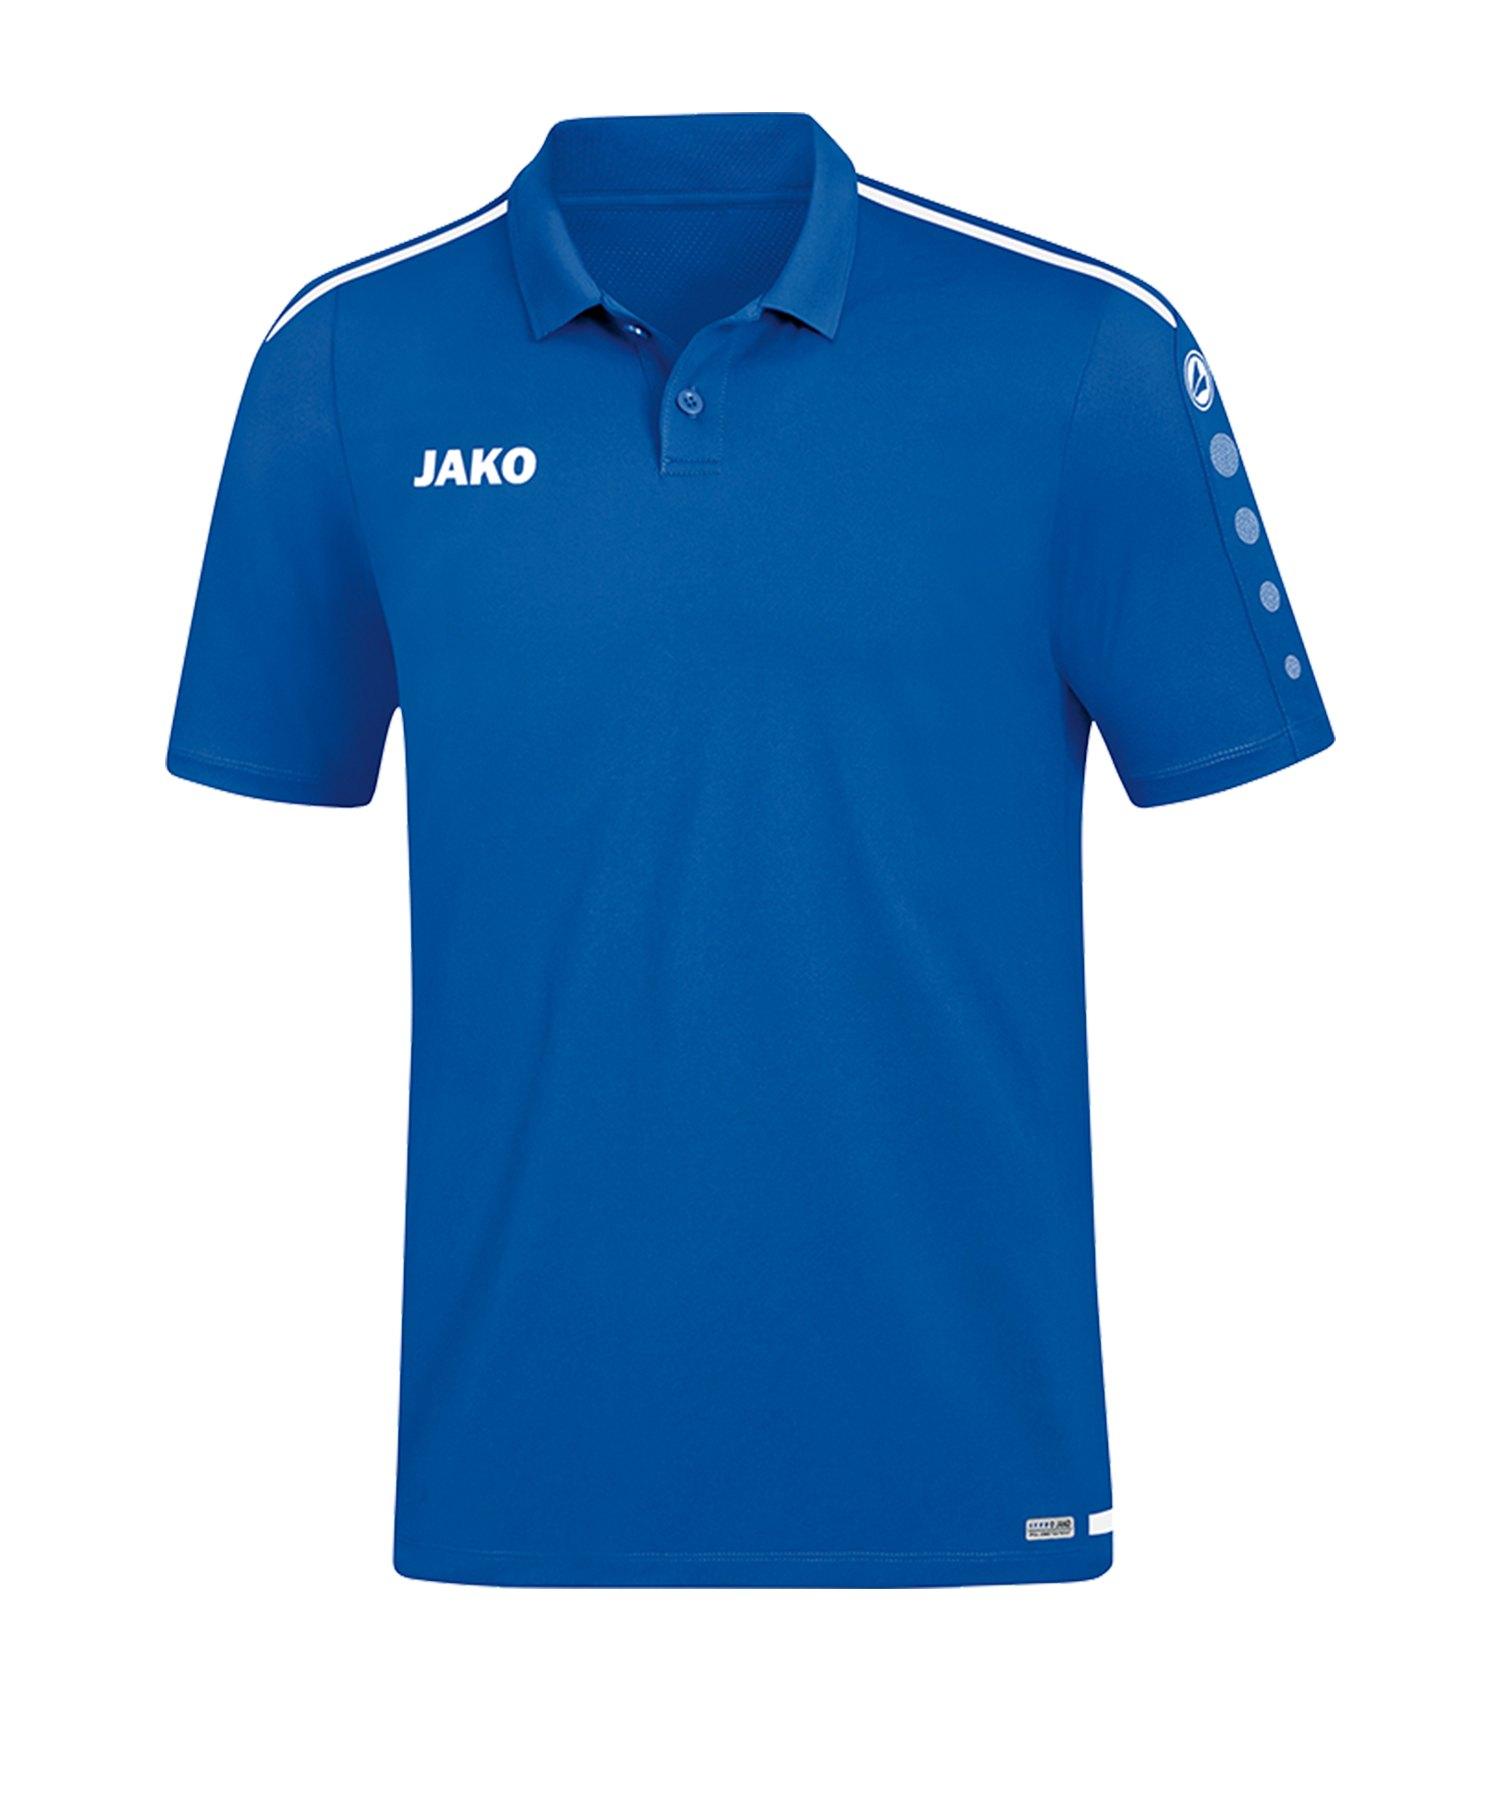 Jako Striker 2.0 Poloshirt Blau Weiss F04 - Blau